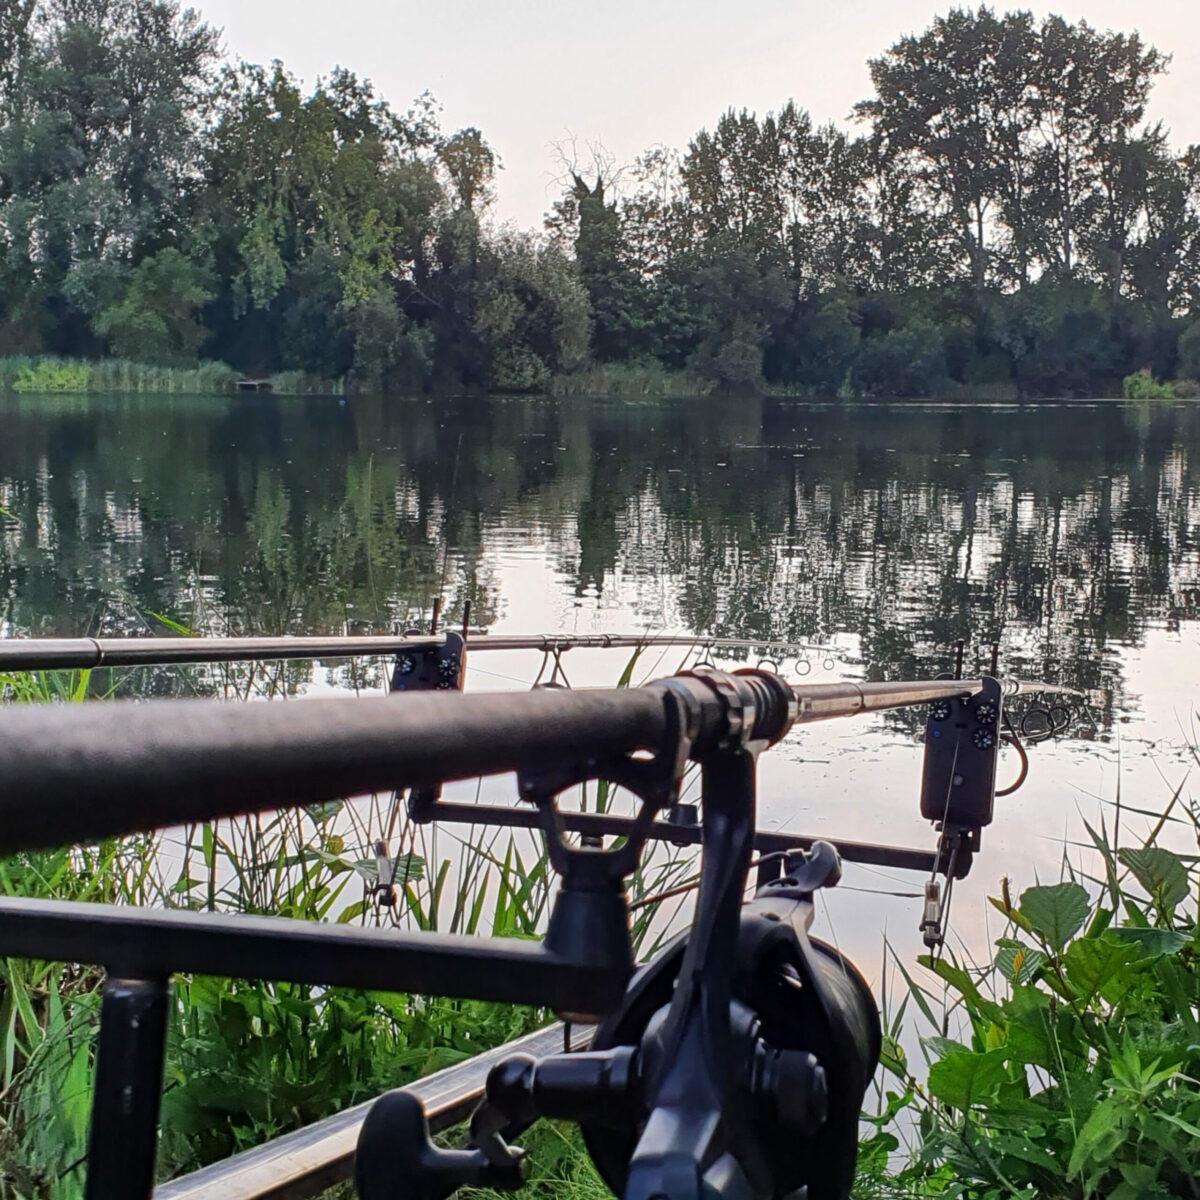 Quest Fishing Adventures - Carp Pike Barbel Chub Perch Bream Roach Gotta Catch Them All 36: Nandos Lake 014 / Carp Fishing